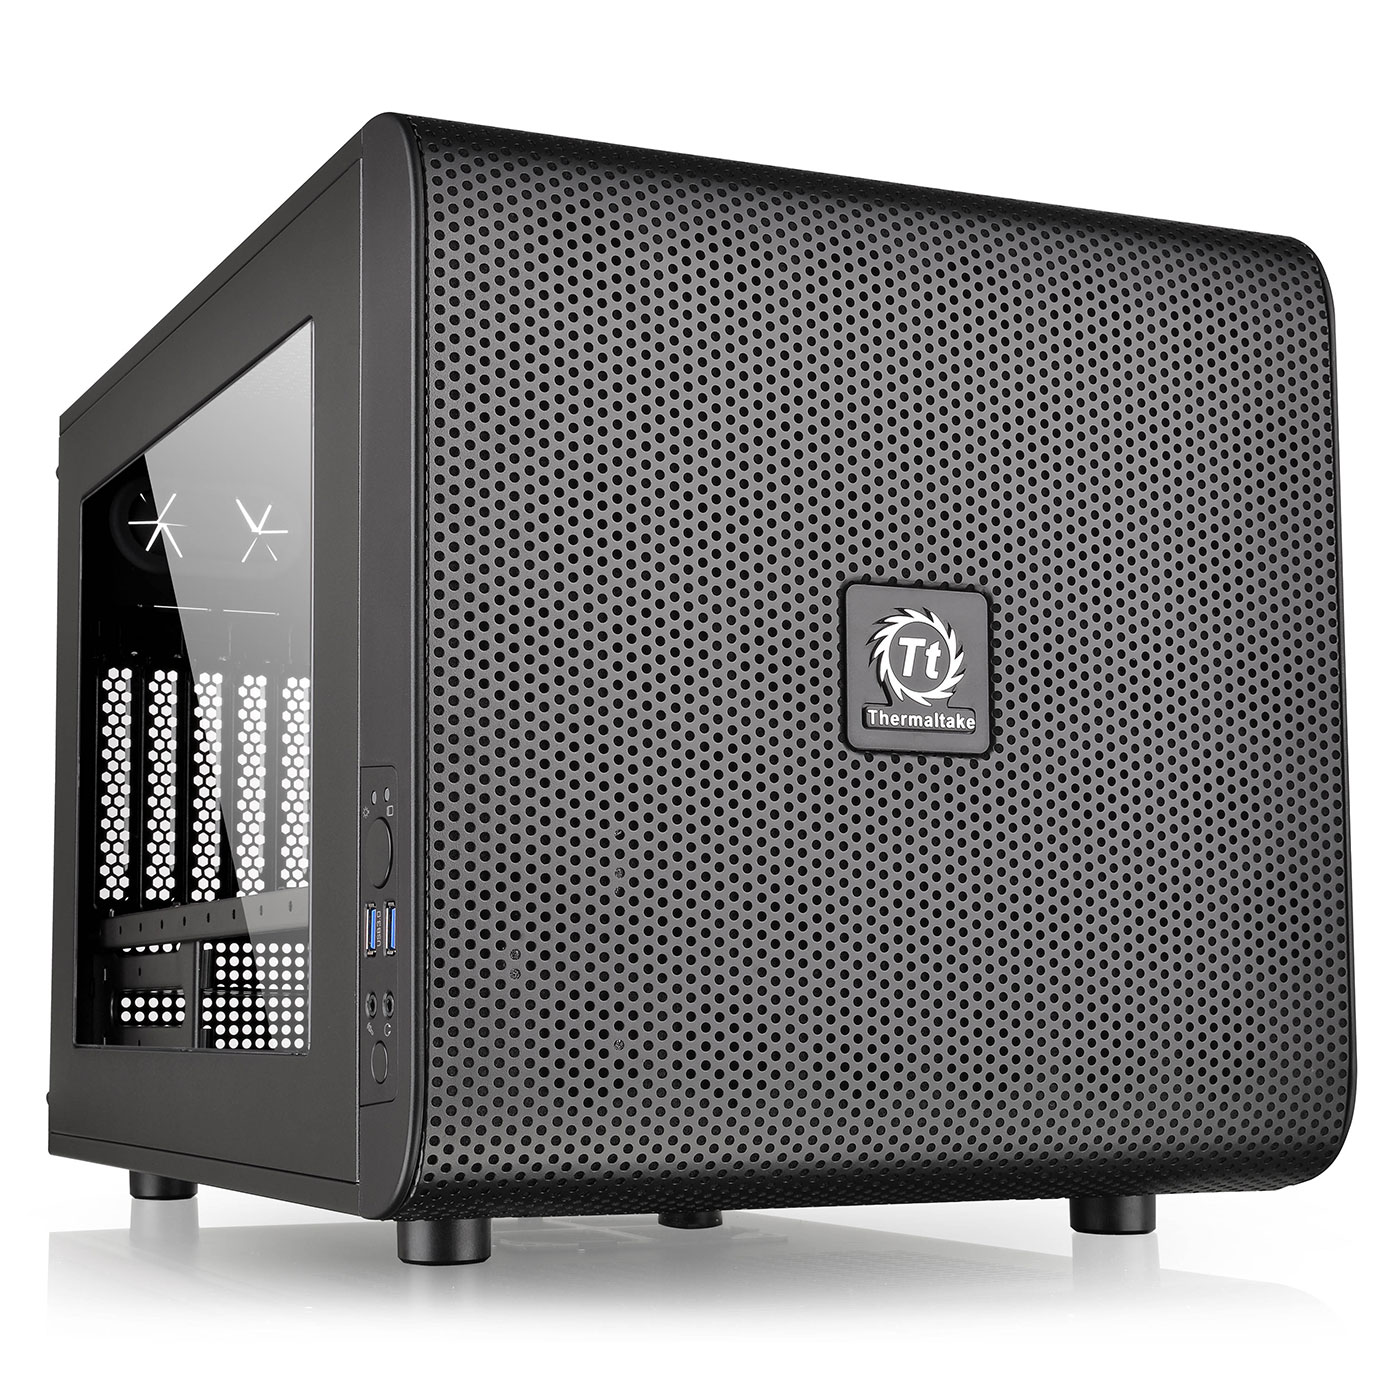 Boîtier PC Thermaltake Core V21 Boîtier Mini Tour